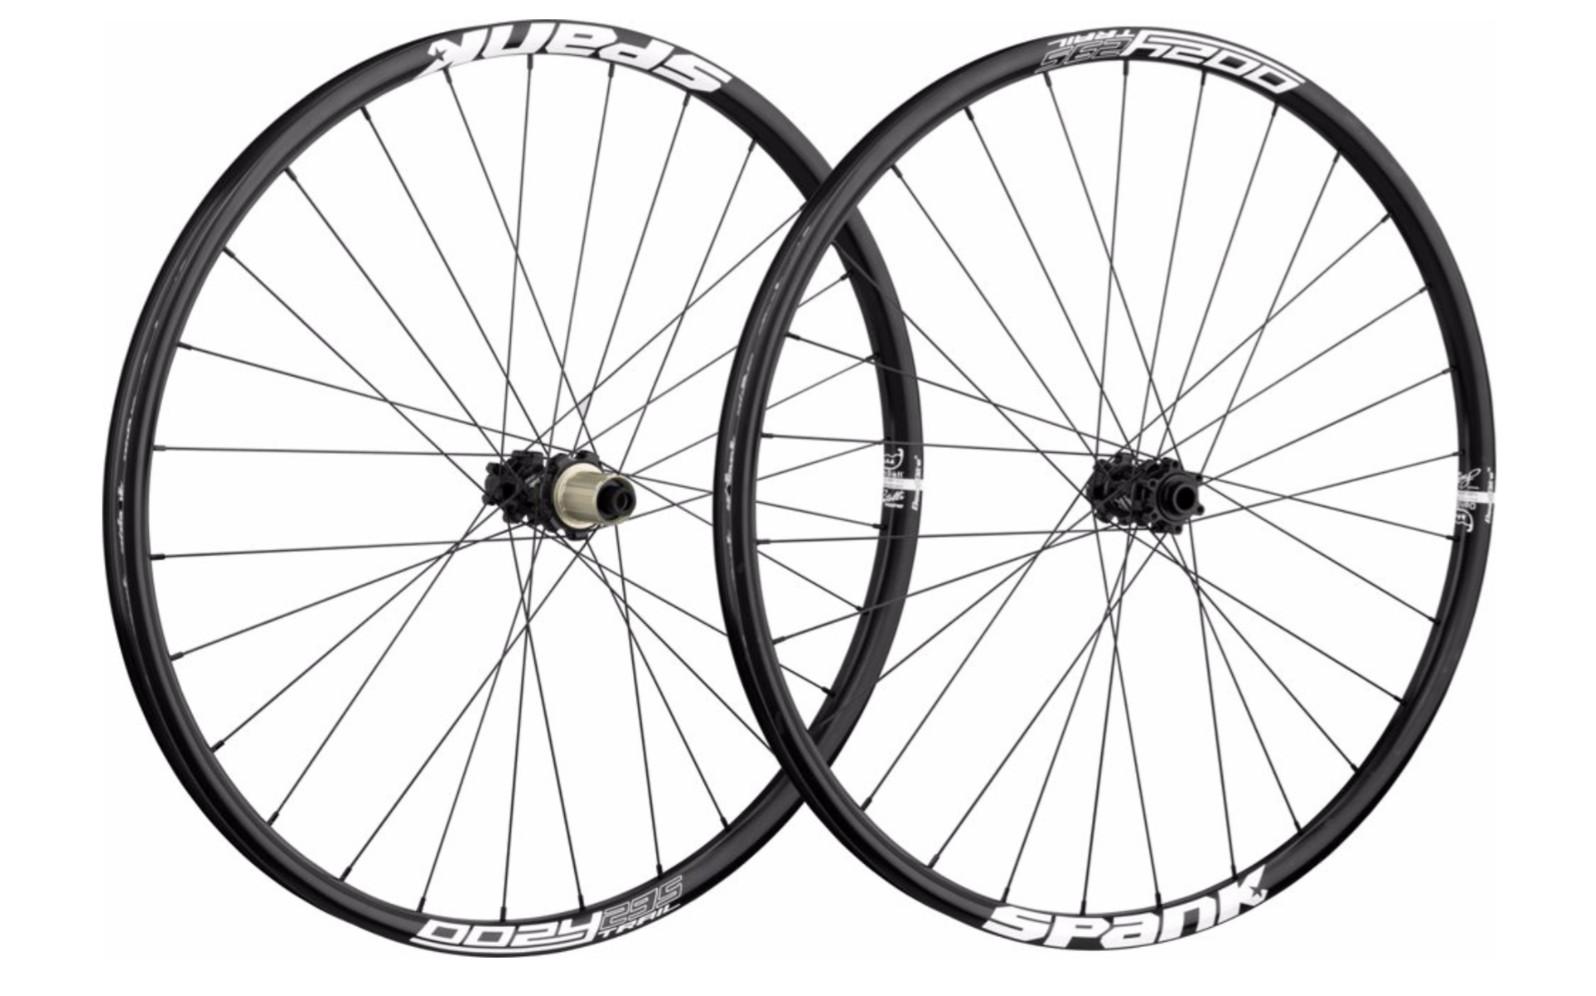 Spank Oozy Trail 295 (32 Hole) Wheelset (black)